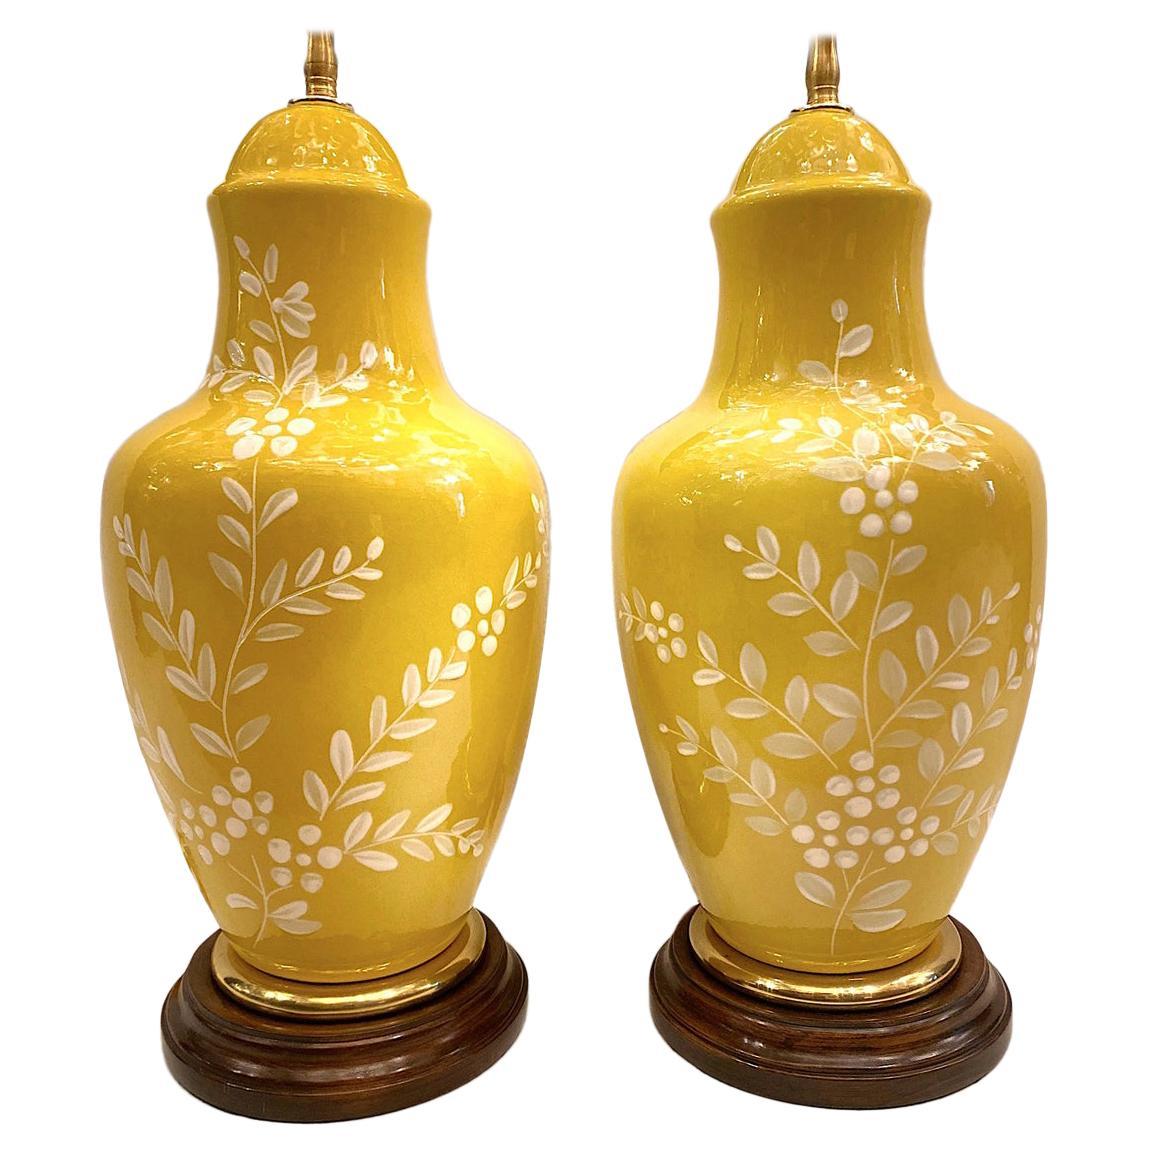 Pair of Italian Porcelain Foliage Motif Table Lamps